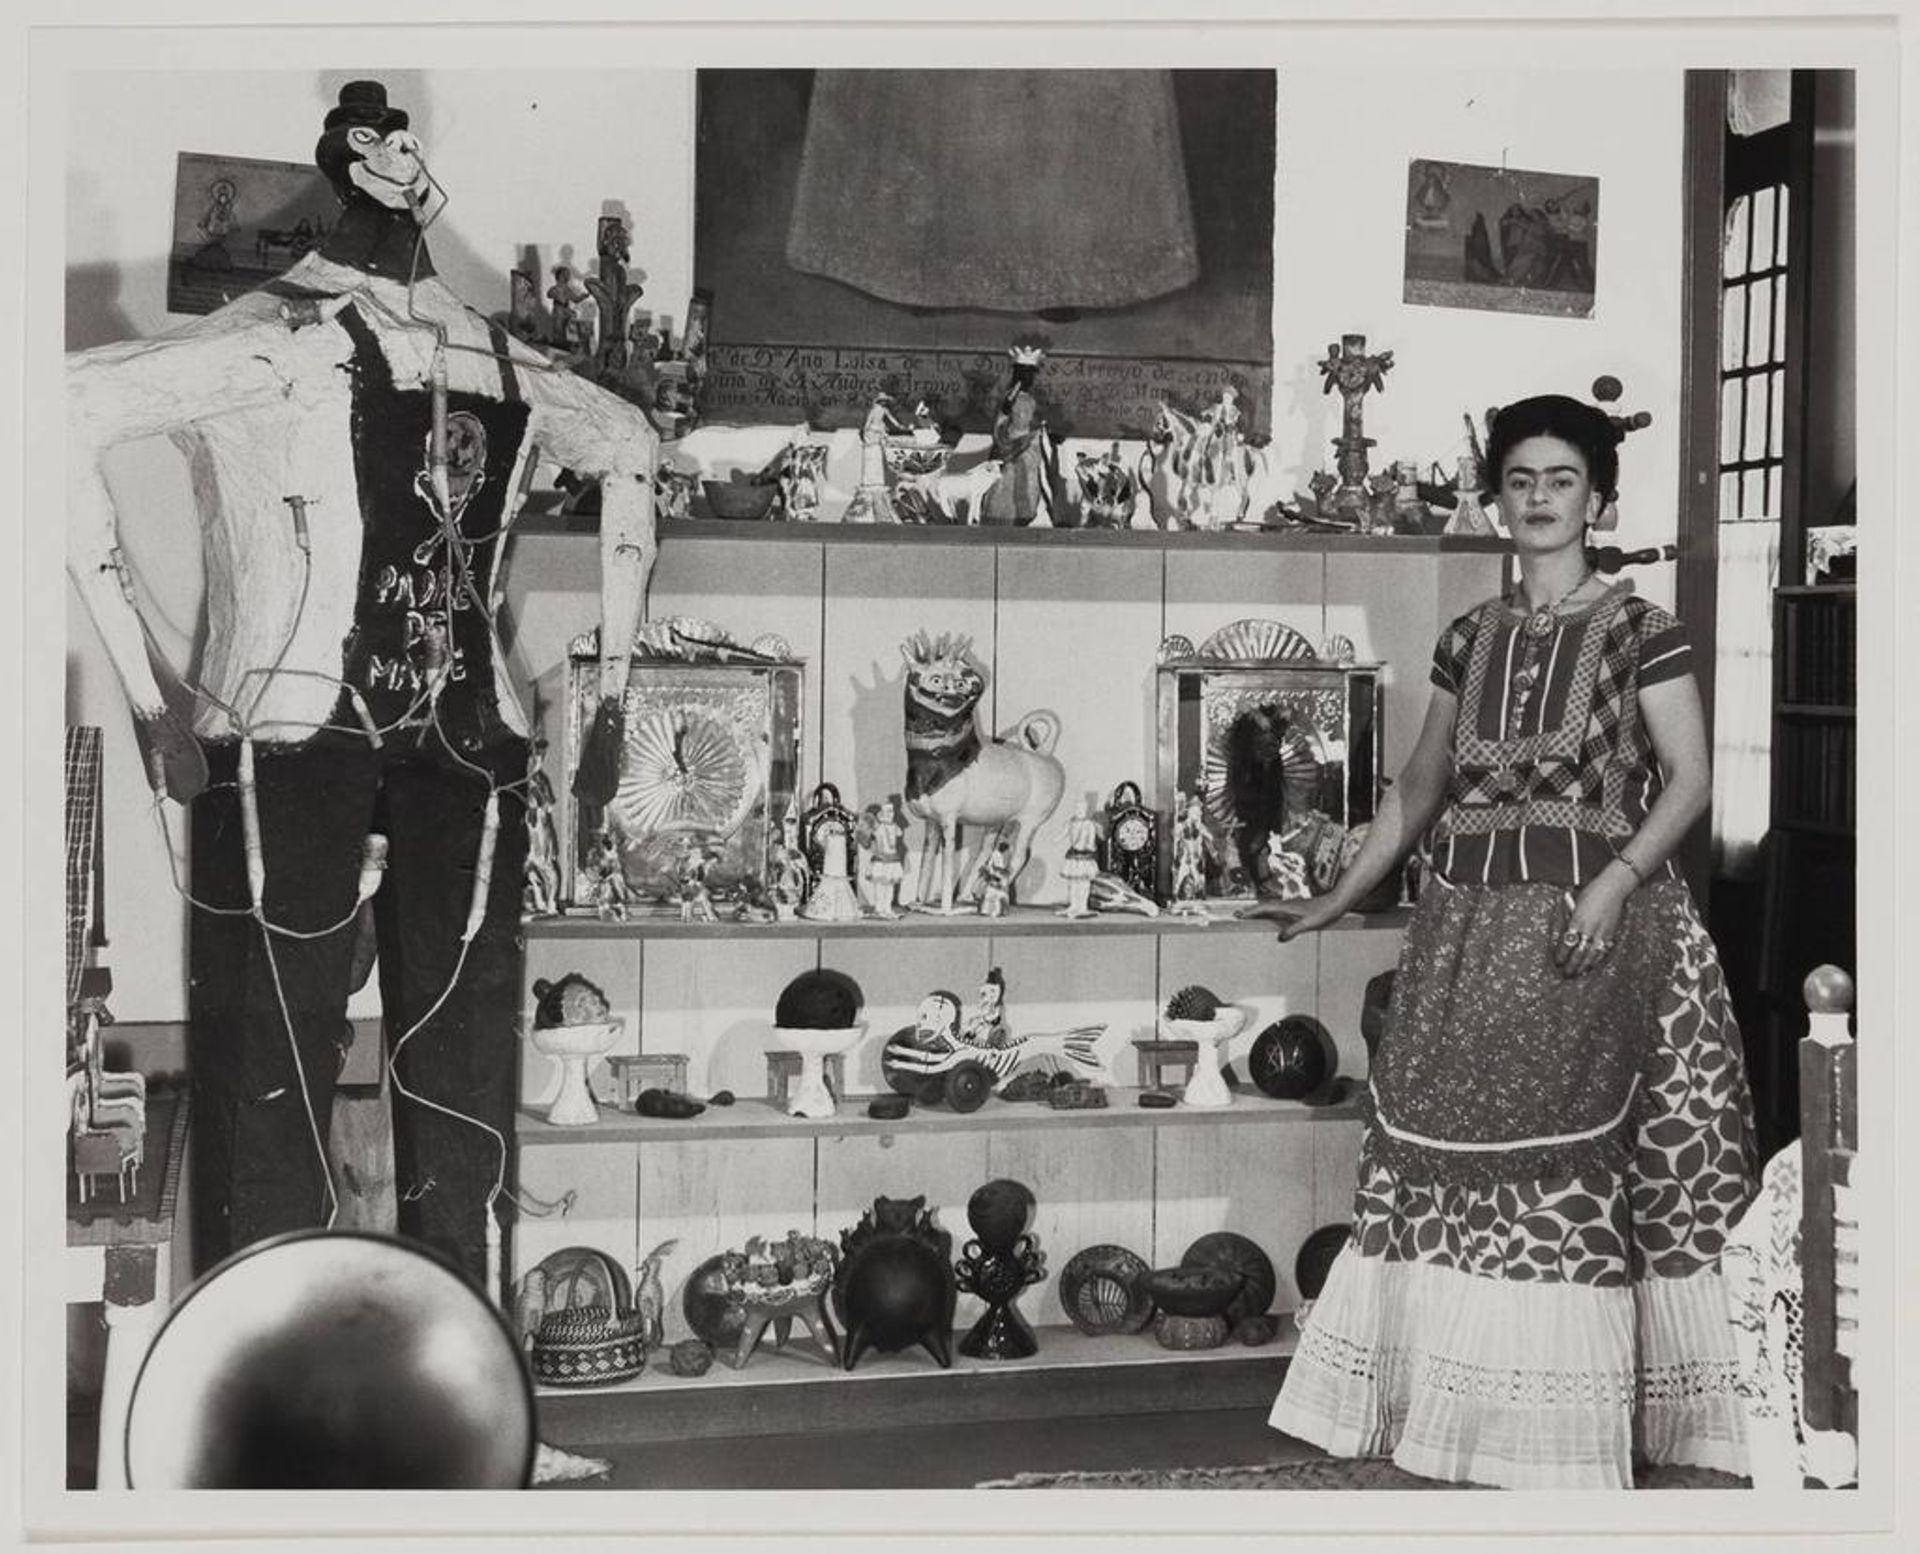 Bernard Silberstein, Frida Kahlo in Rivera Living Room with Figure of Judas, around 1940. Courtesy of the Museum of Fine Arts, Boston.